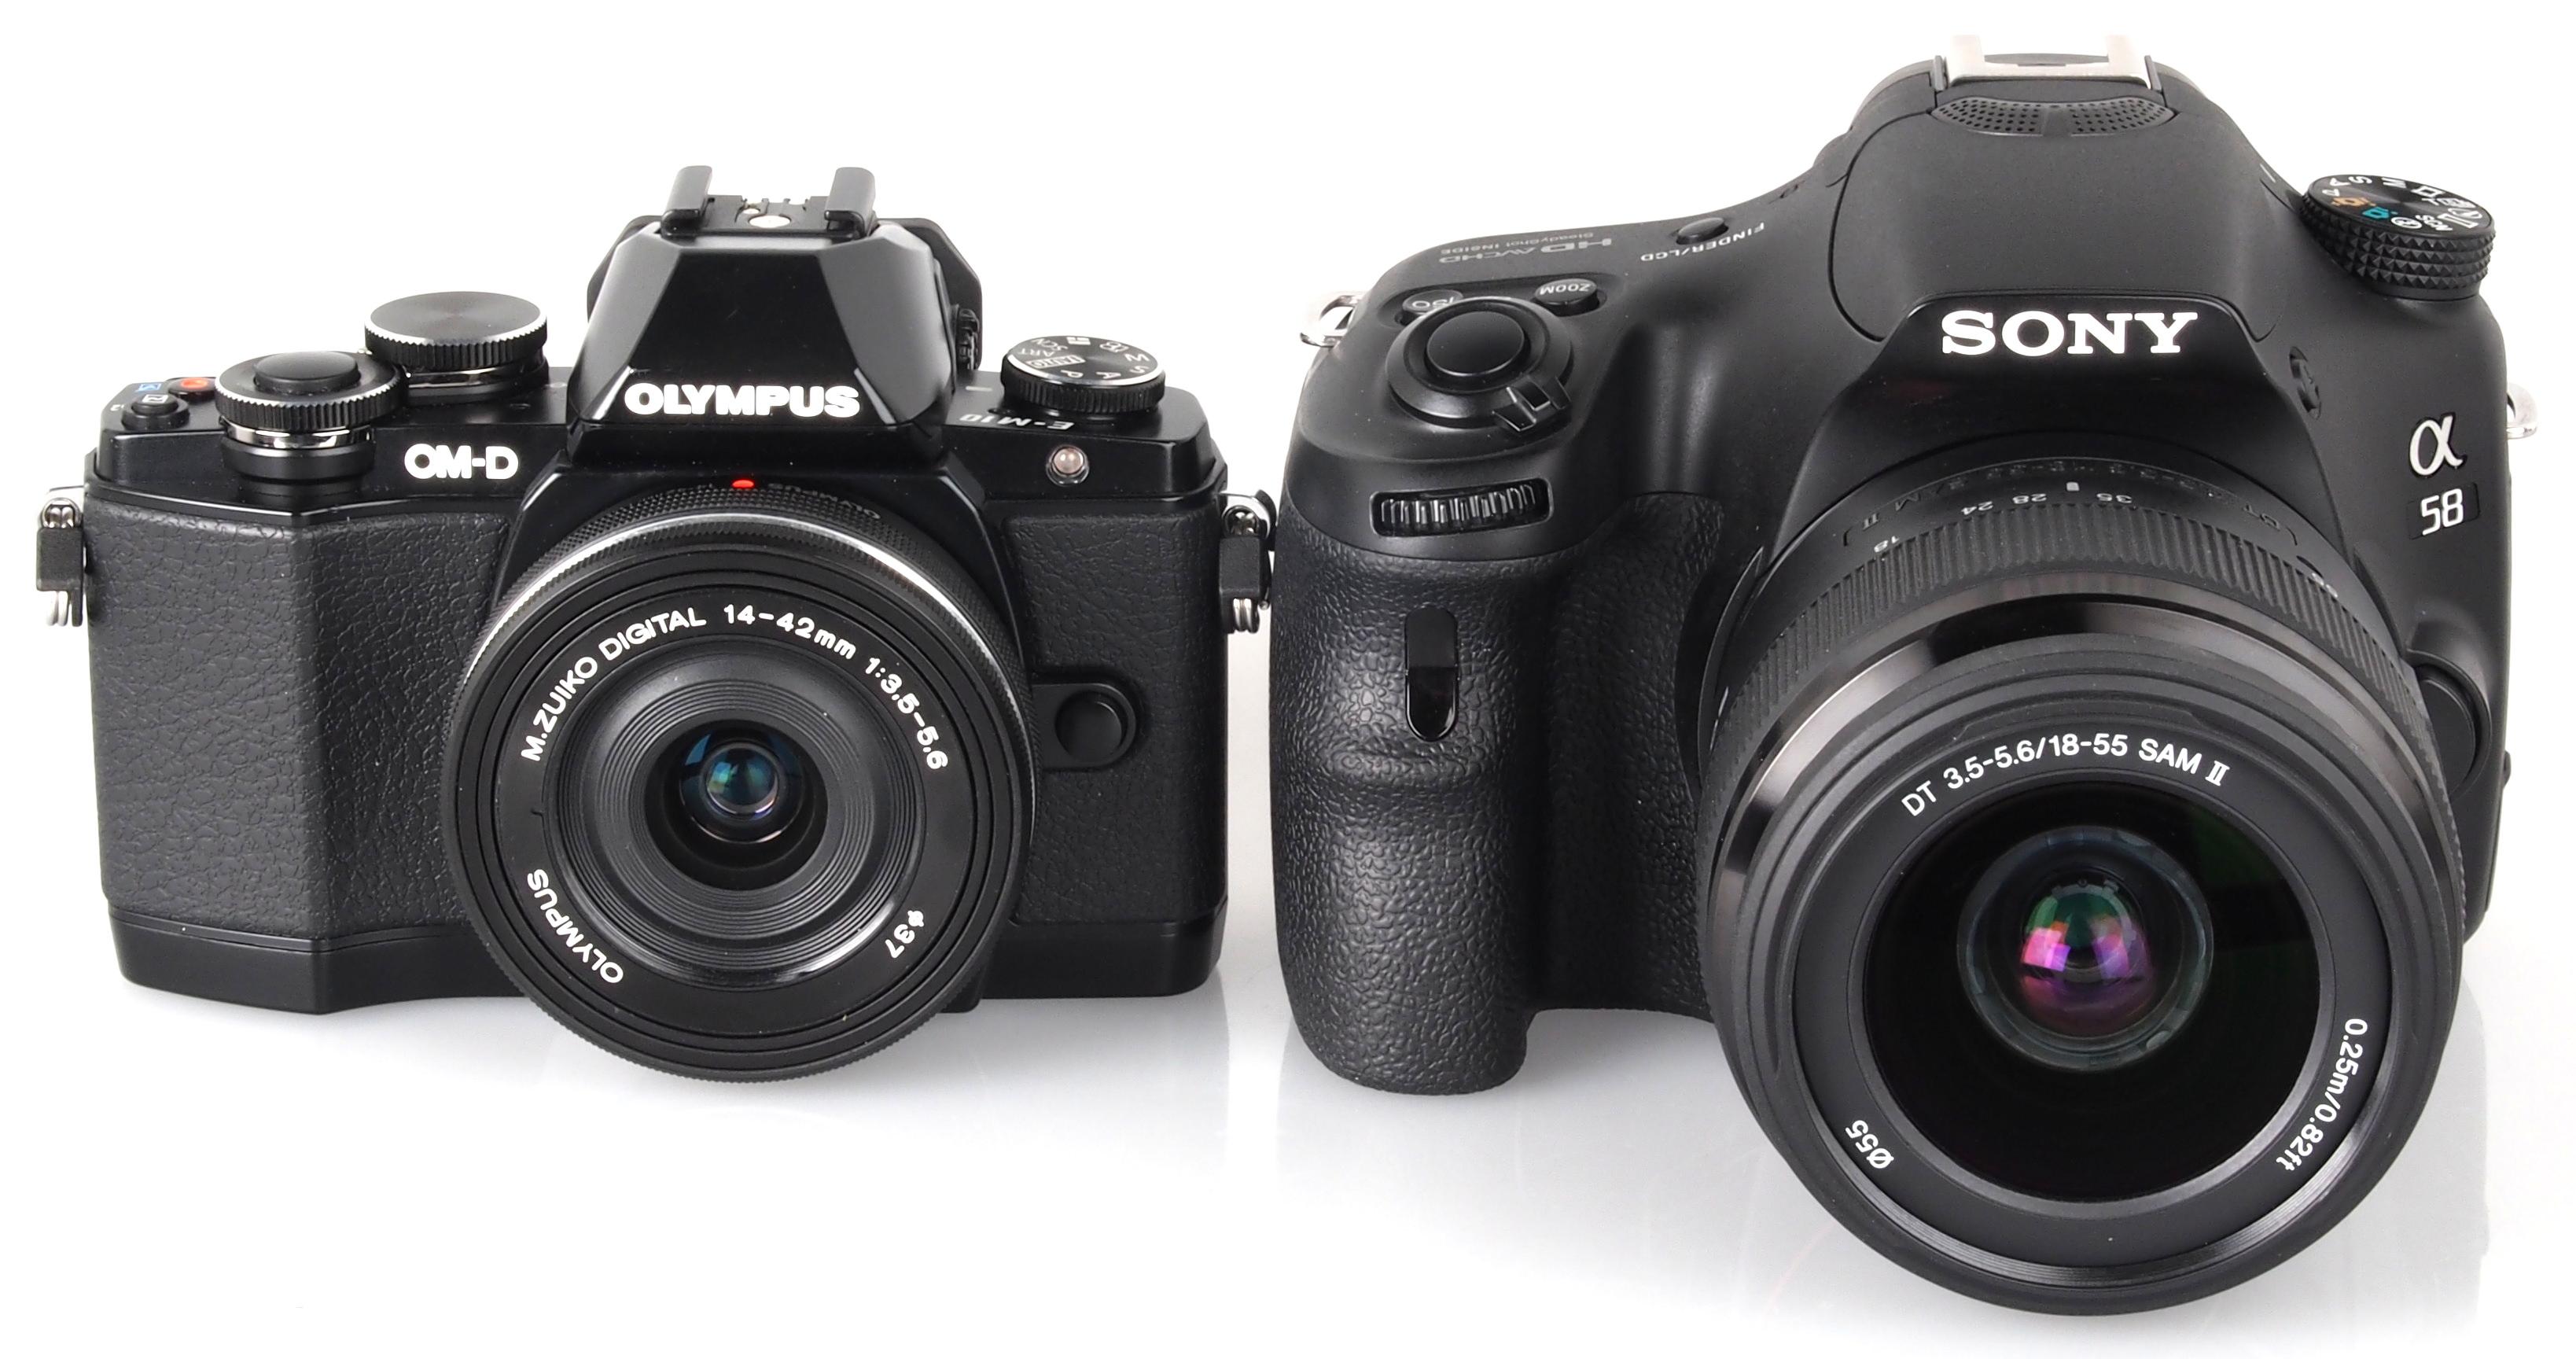 Camera Digital Camera Like Dslr olympus om d e m10 mirrorless vs sony alpha a58 dslr 14